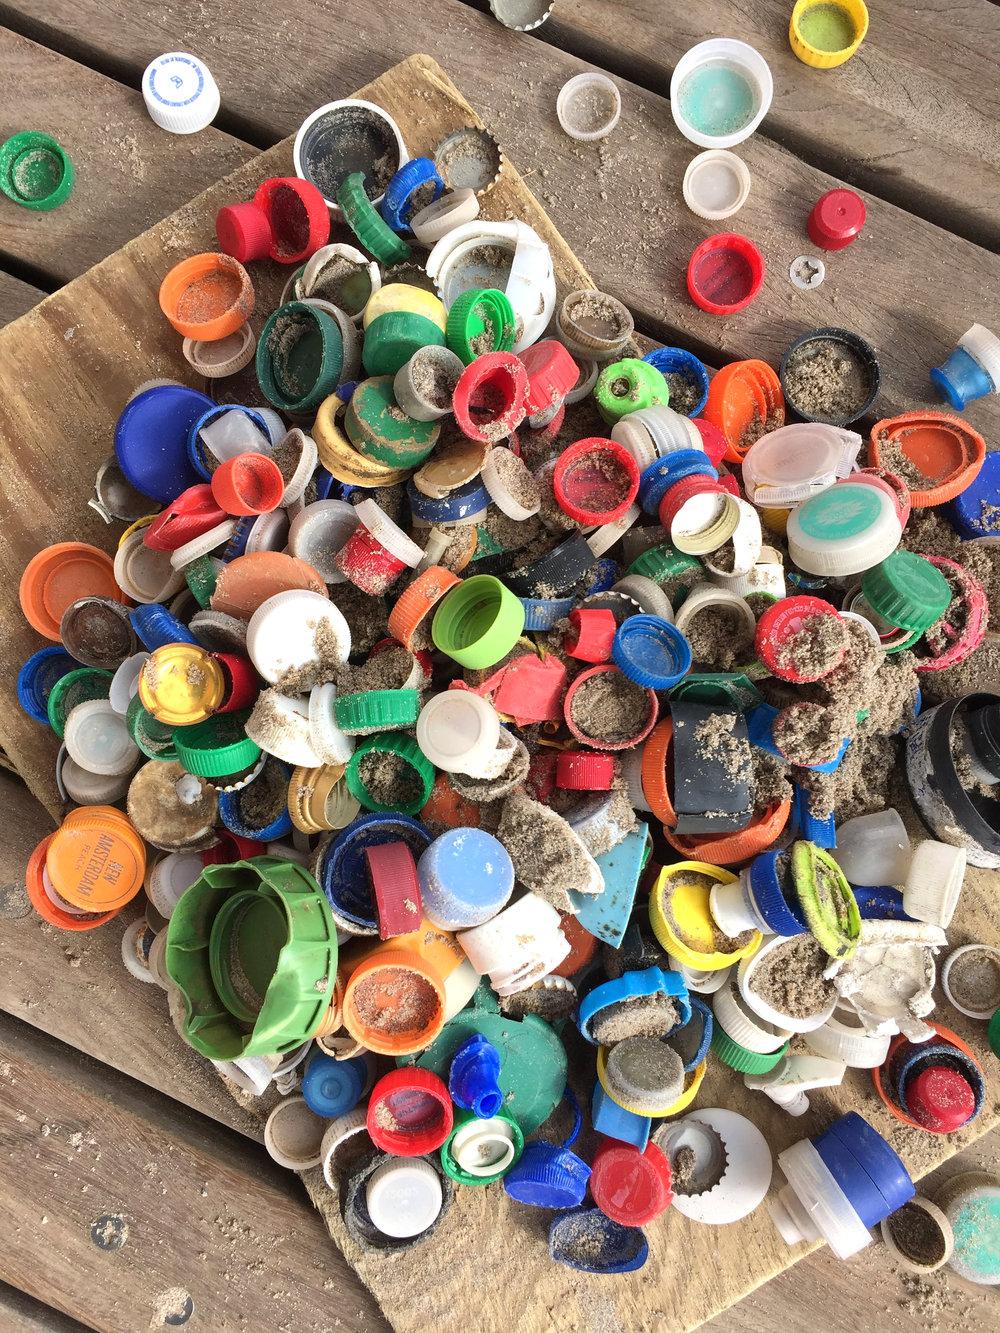 amy_chen_design_coney_island_beach_clean_up_bottle_caps.JPG